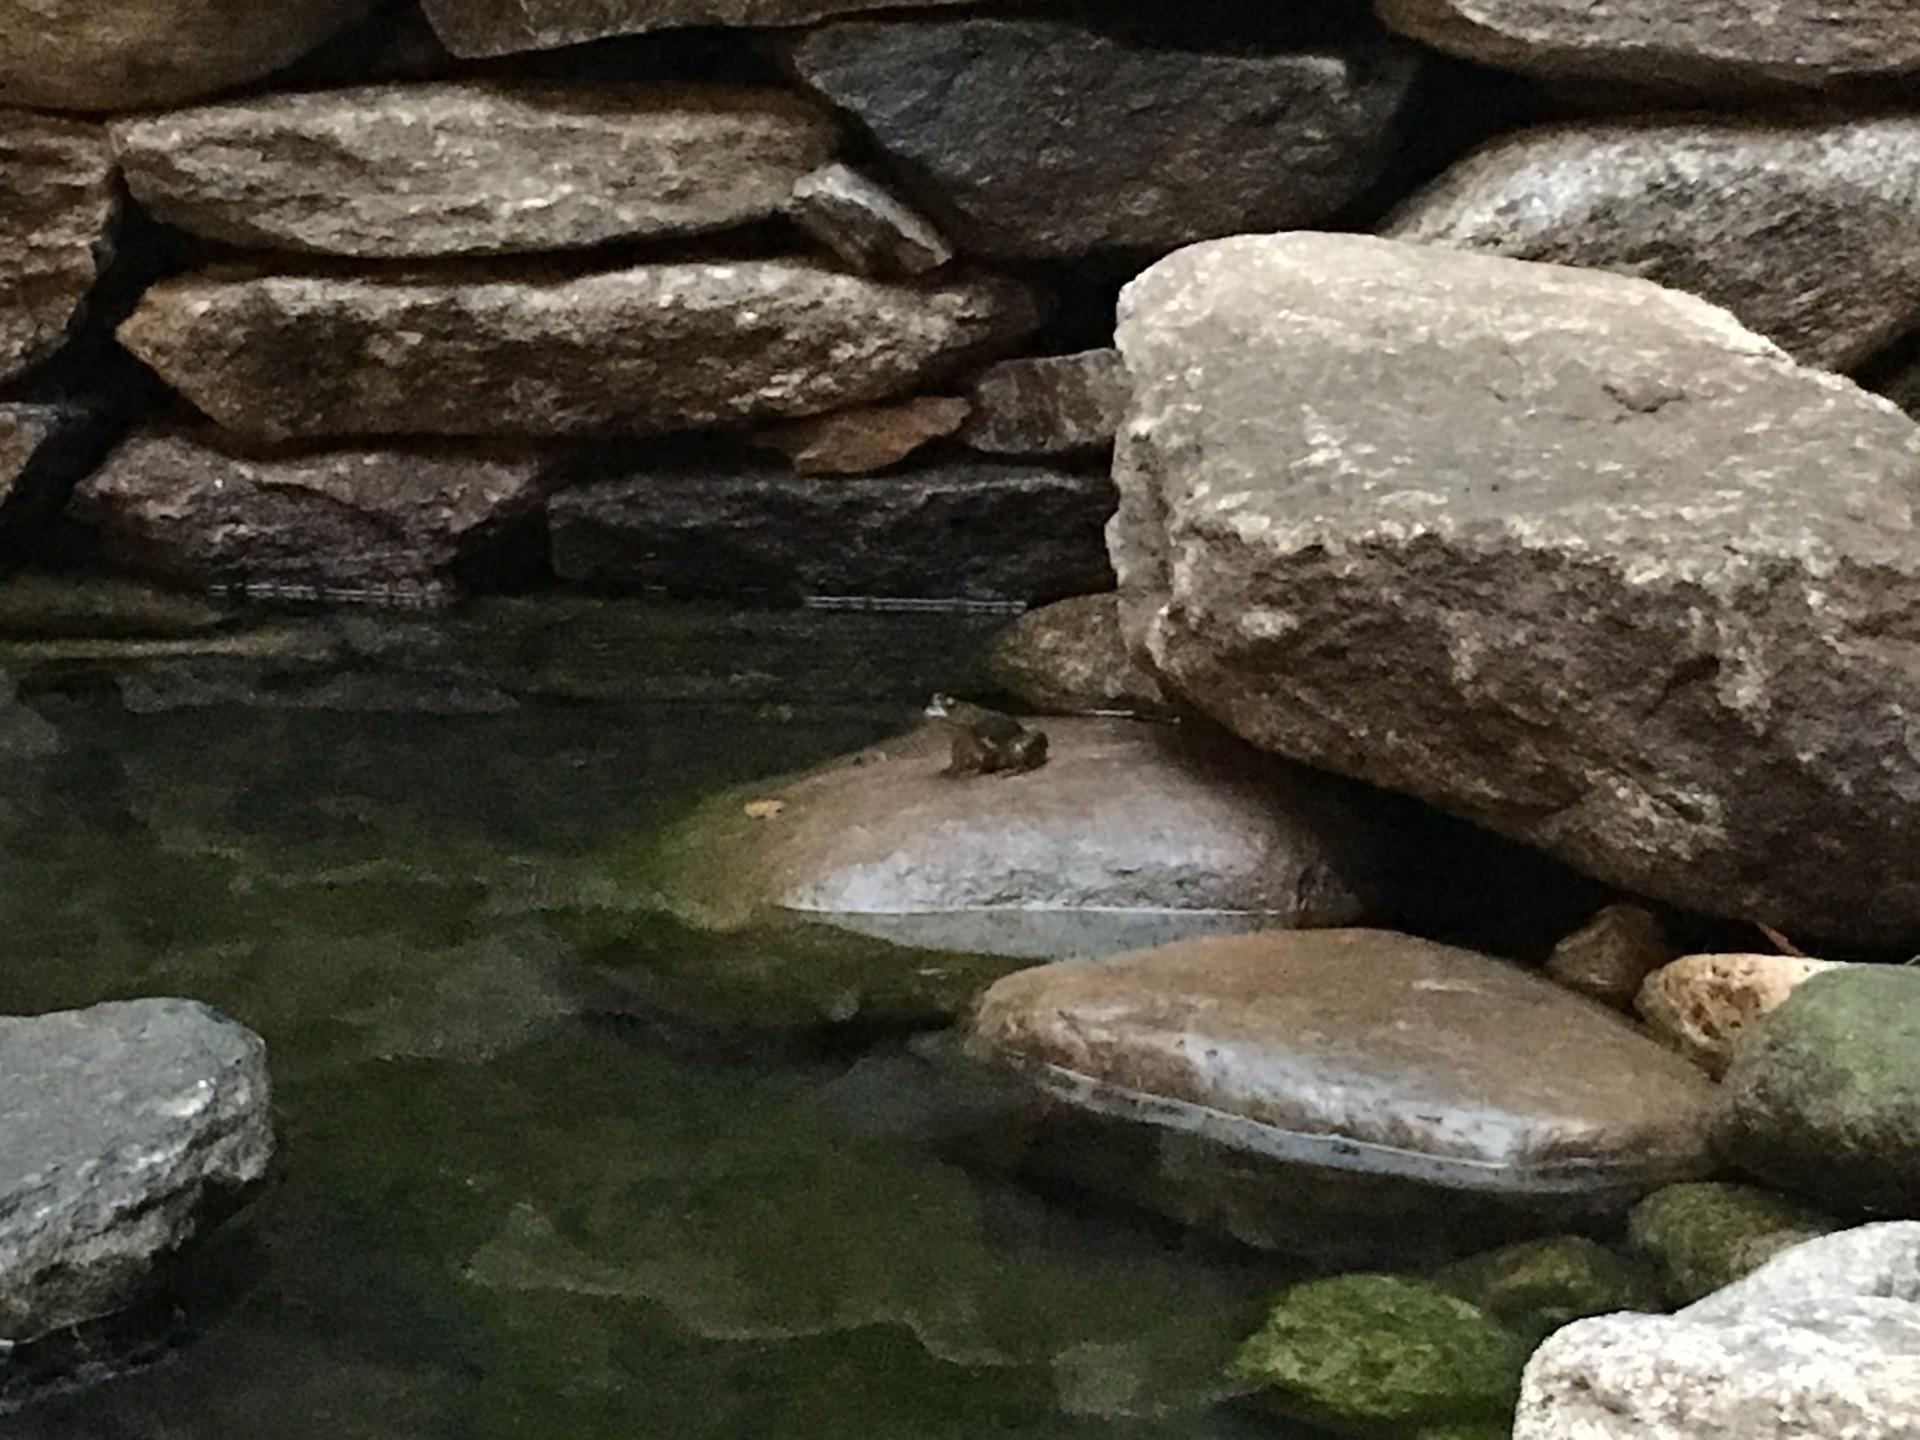 Small frog enjoying the pool